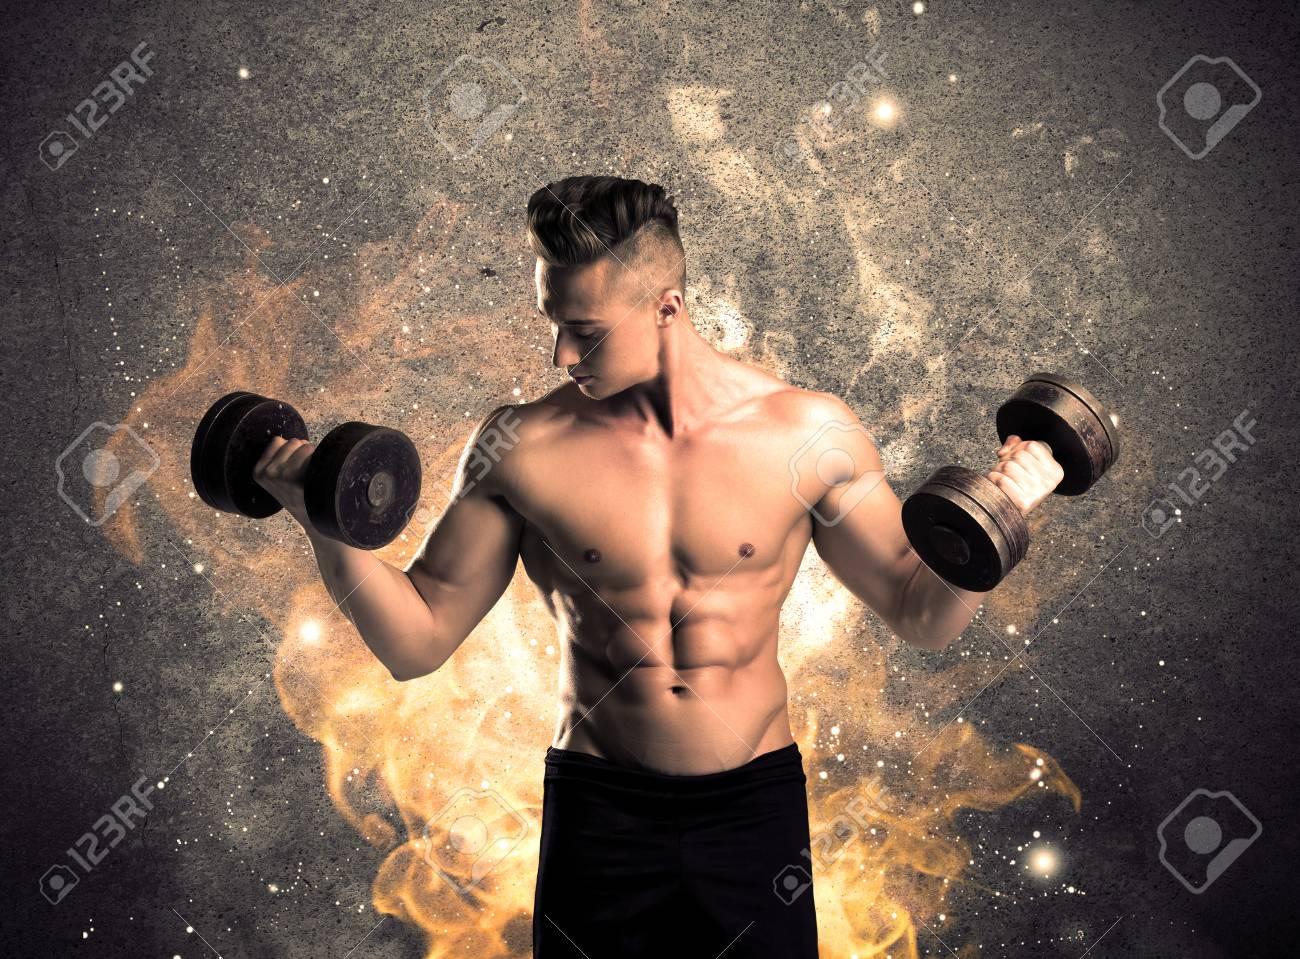 brennende mann nackt